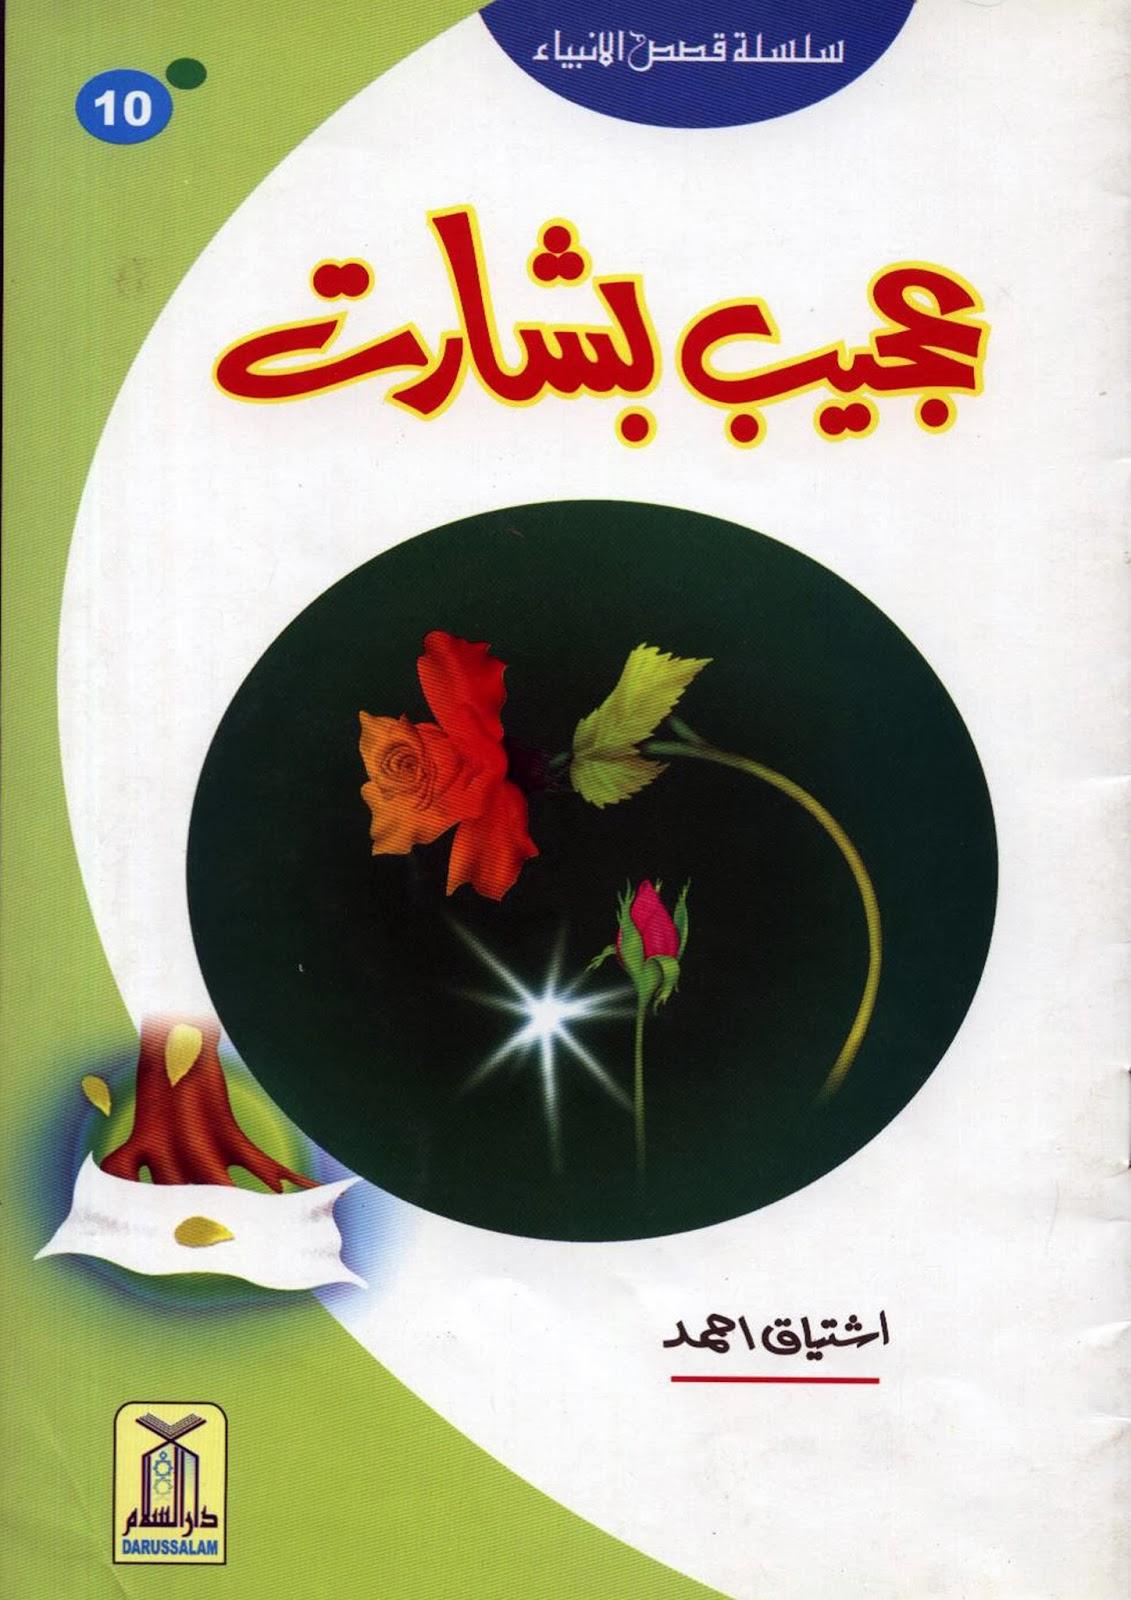 http://urduguru1.blogspot.com/2014/03/ajeeb-bisharat-prophet-yaqoob-as.html